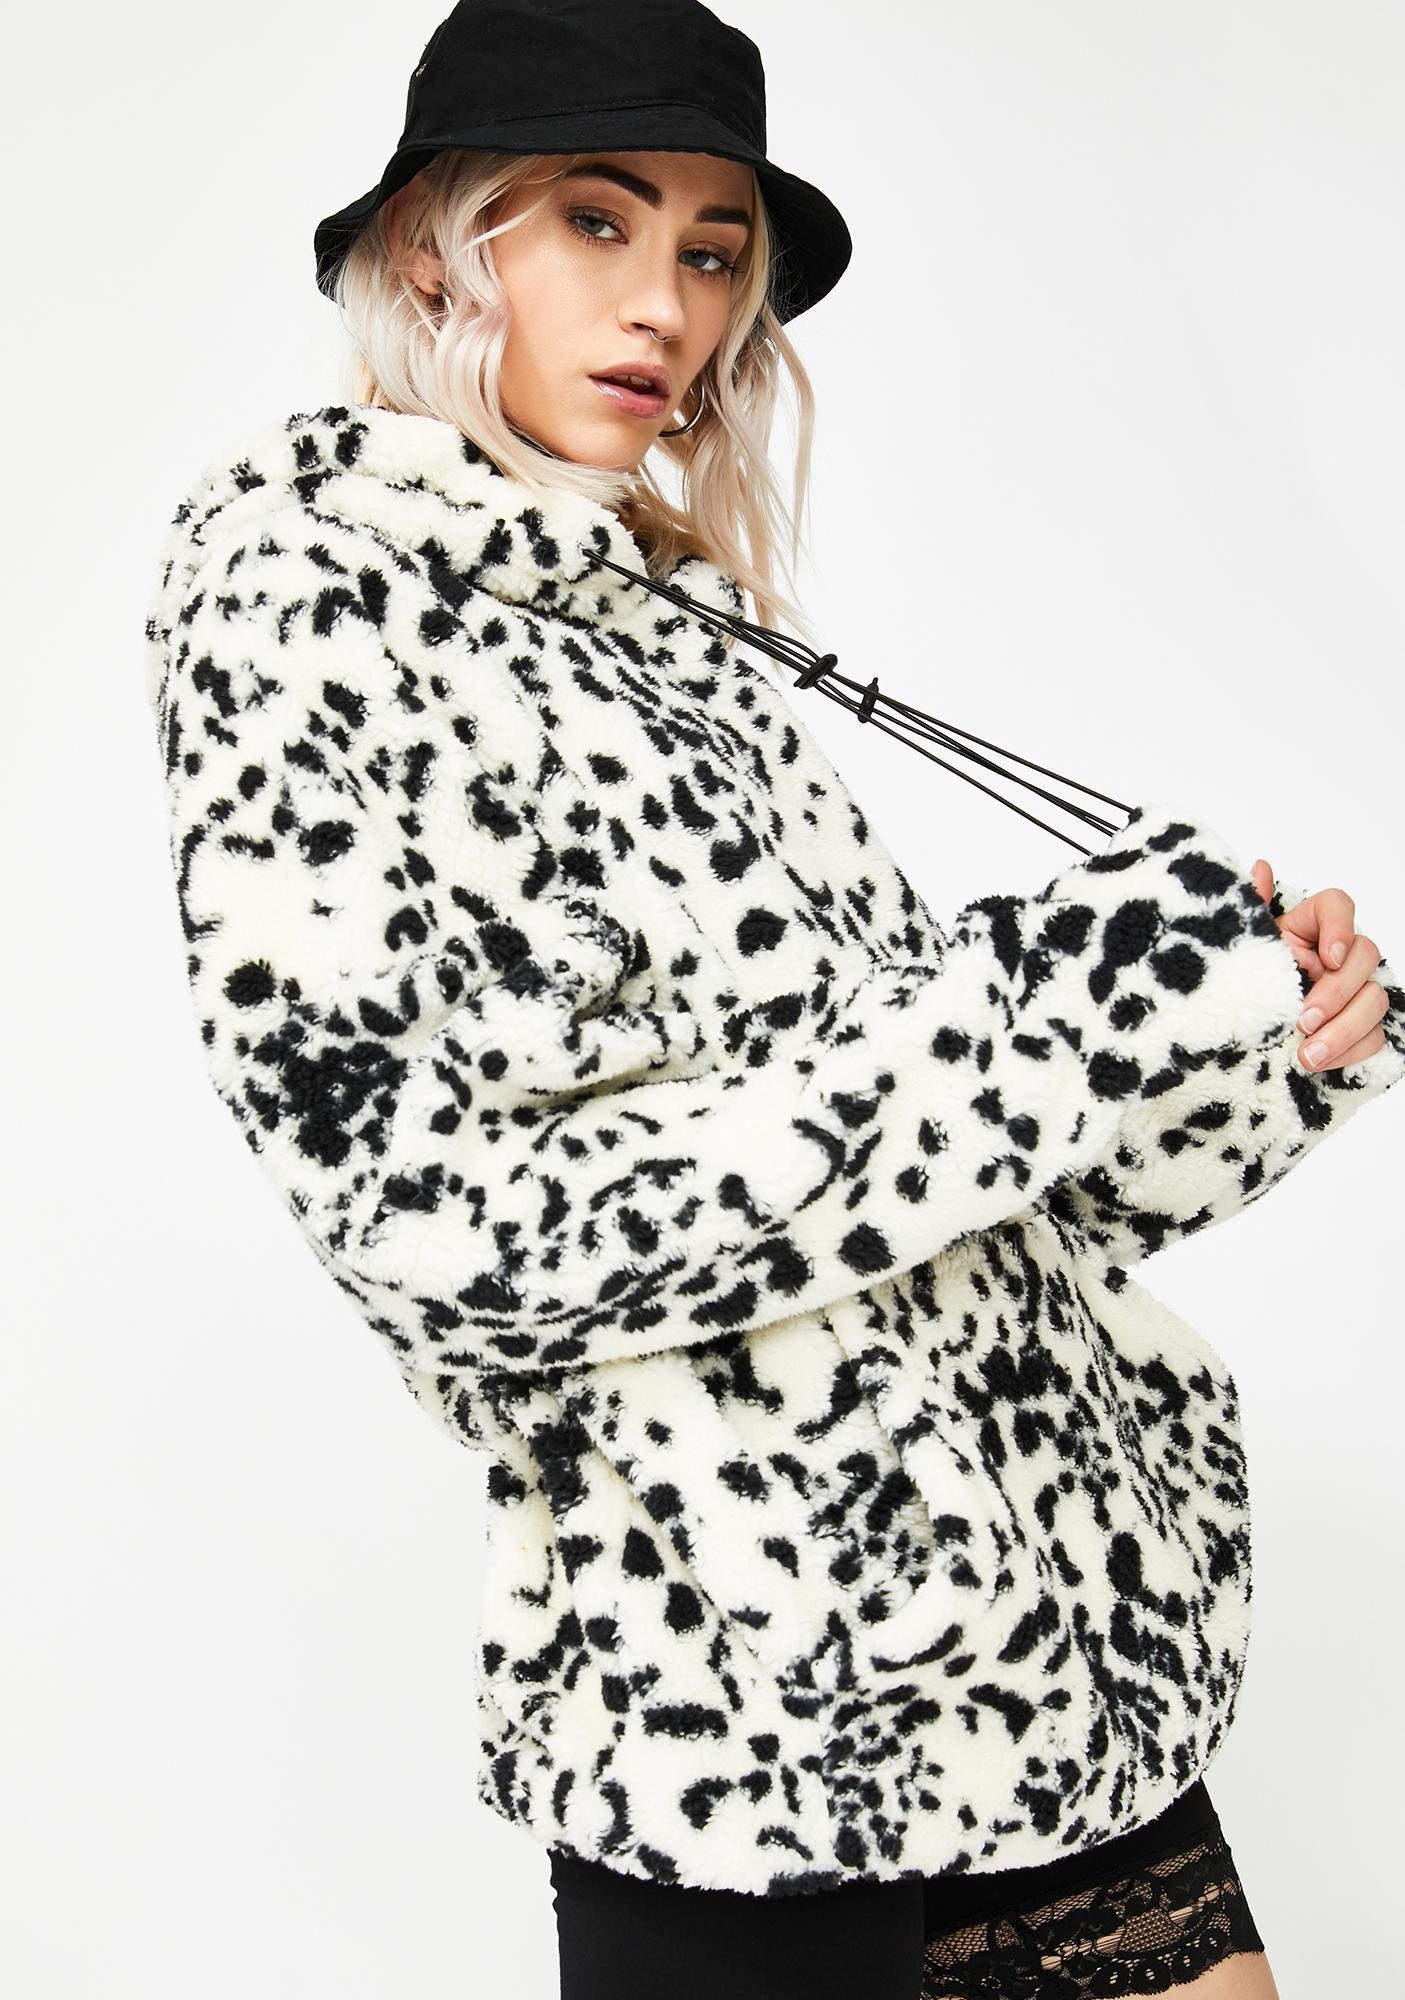 NEW GIRL ORDER Dalmatian Print Teddy Jacket